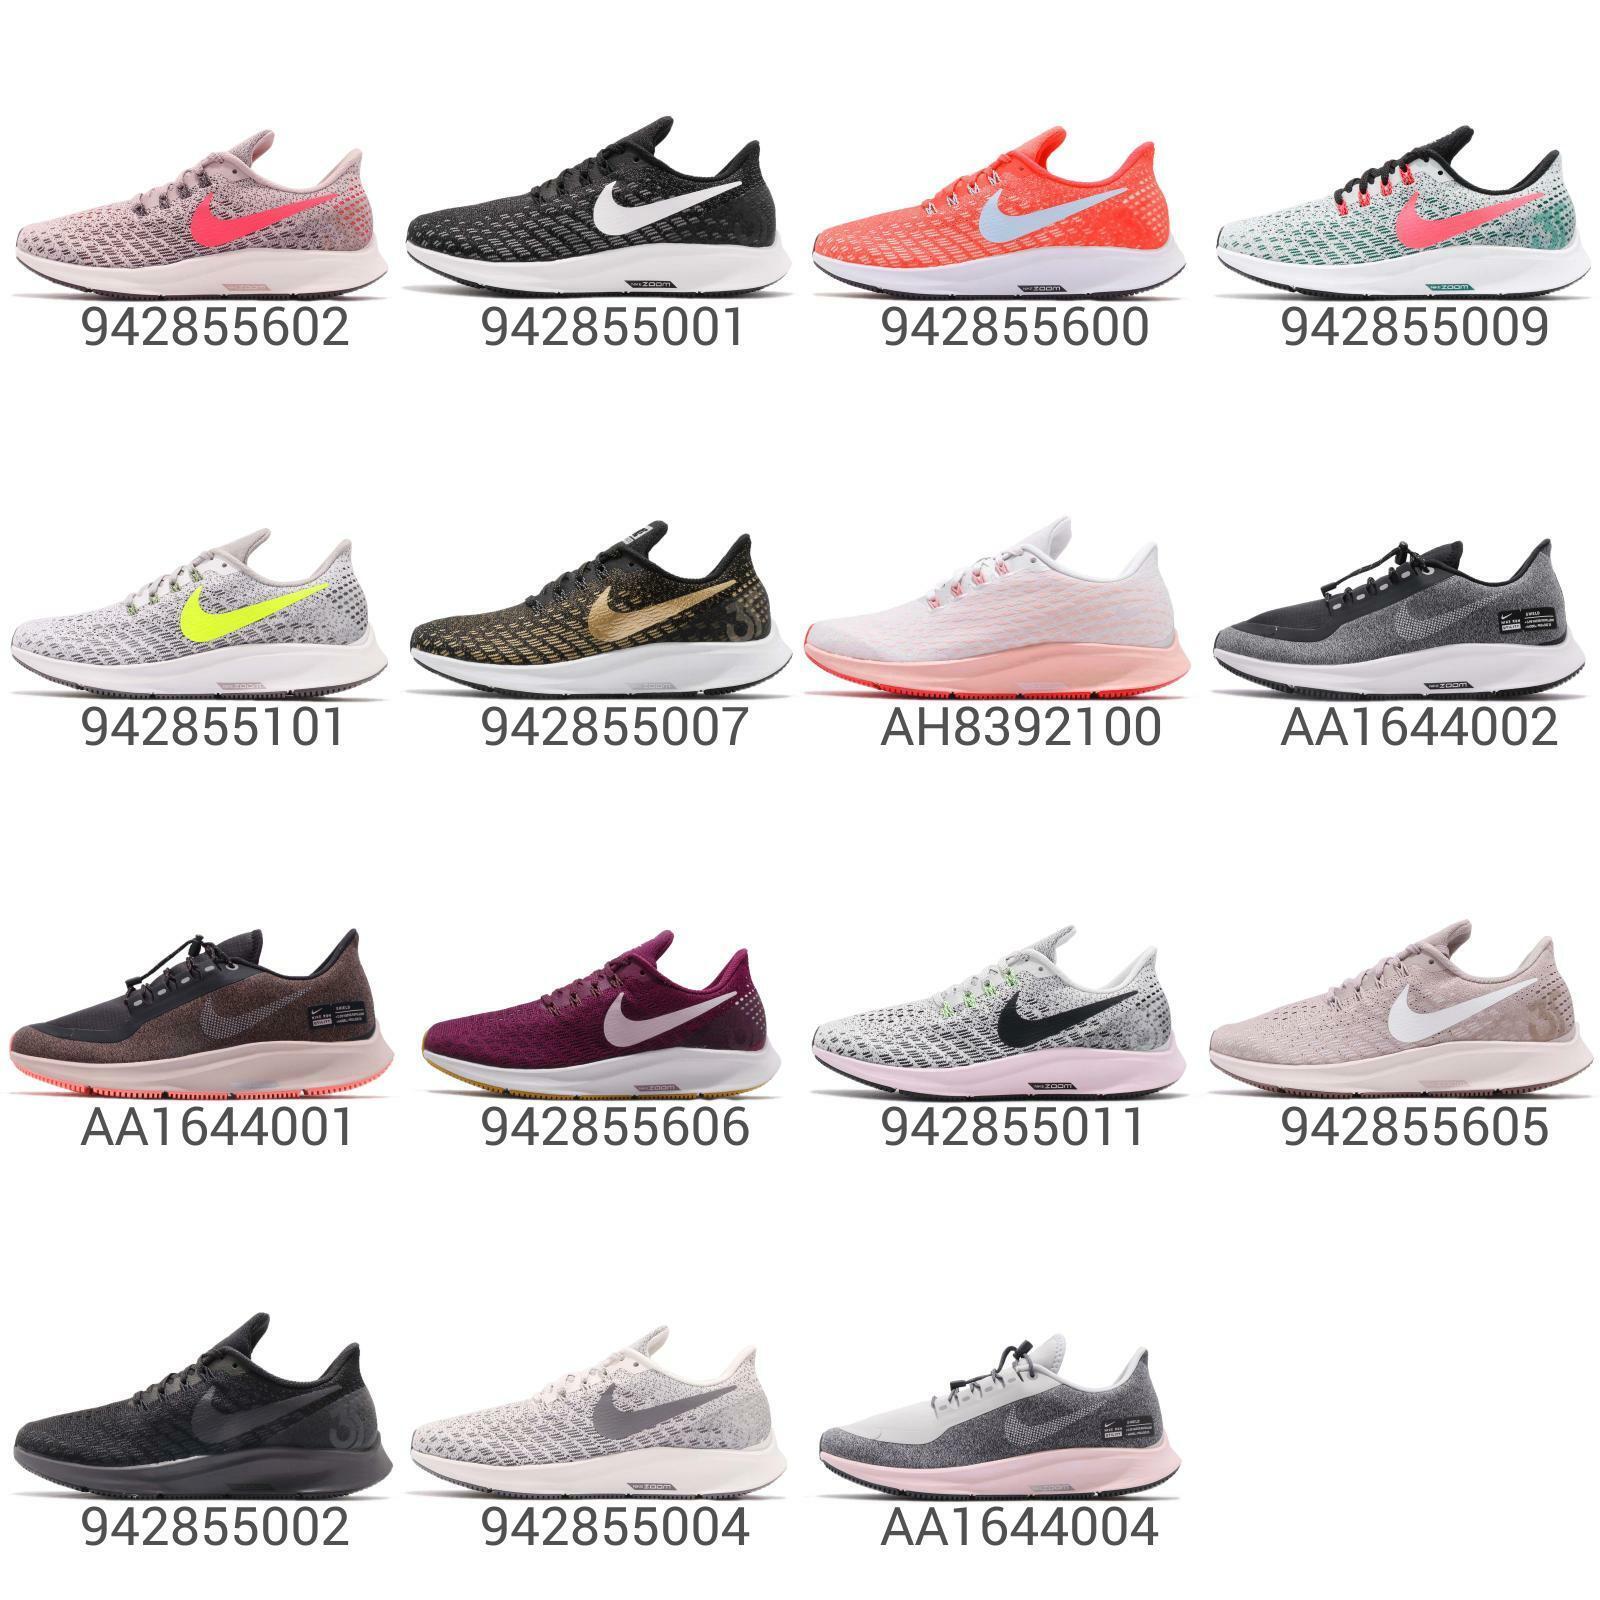 Atomic Pink Nike Air Zoom Winflo 2 WMNS Nike Zoom Winflo 2 II Grey Pink Womens Running Shoes SNEAKERS ...